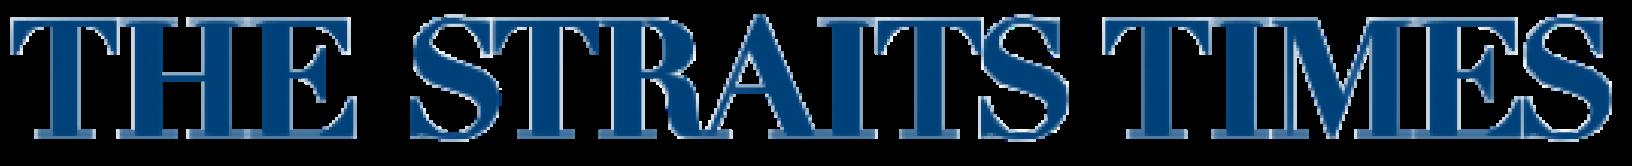 The Straits Times logo.